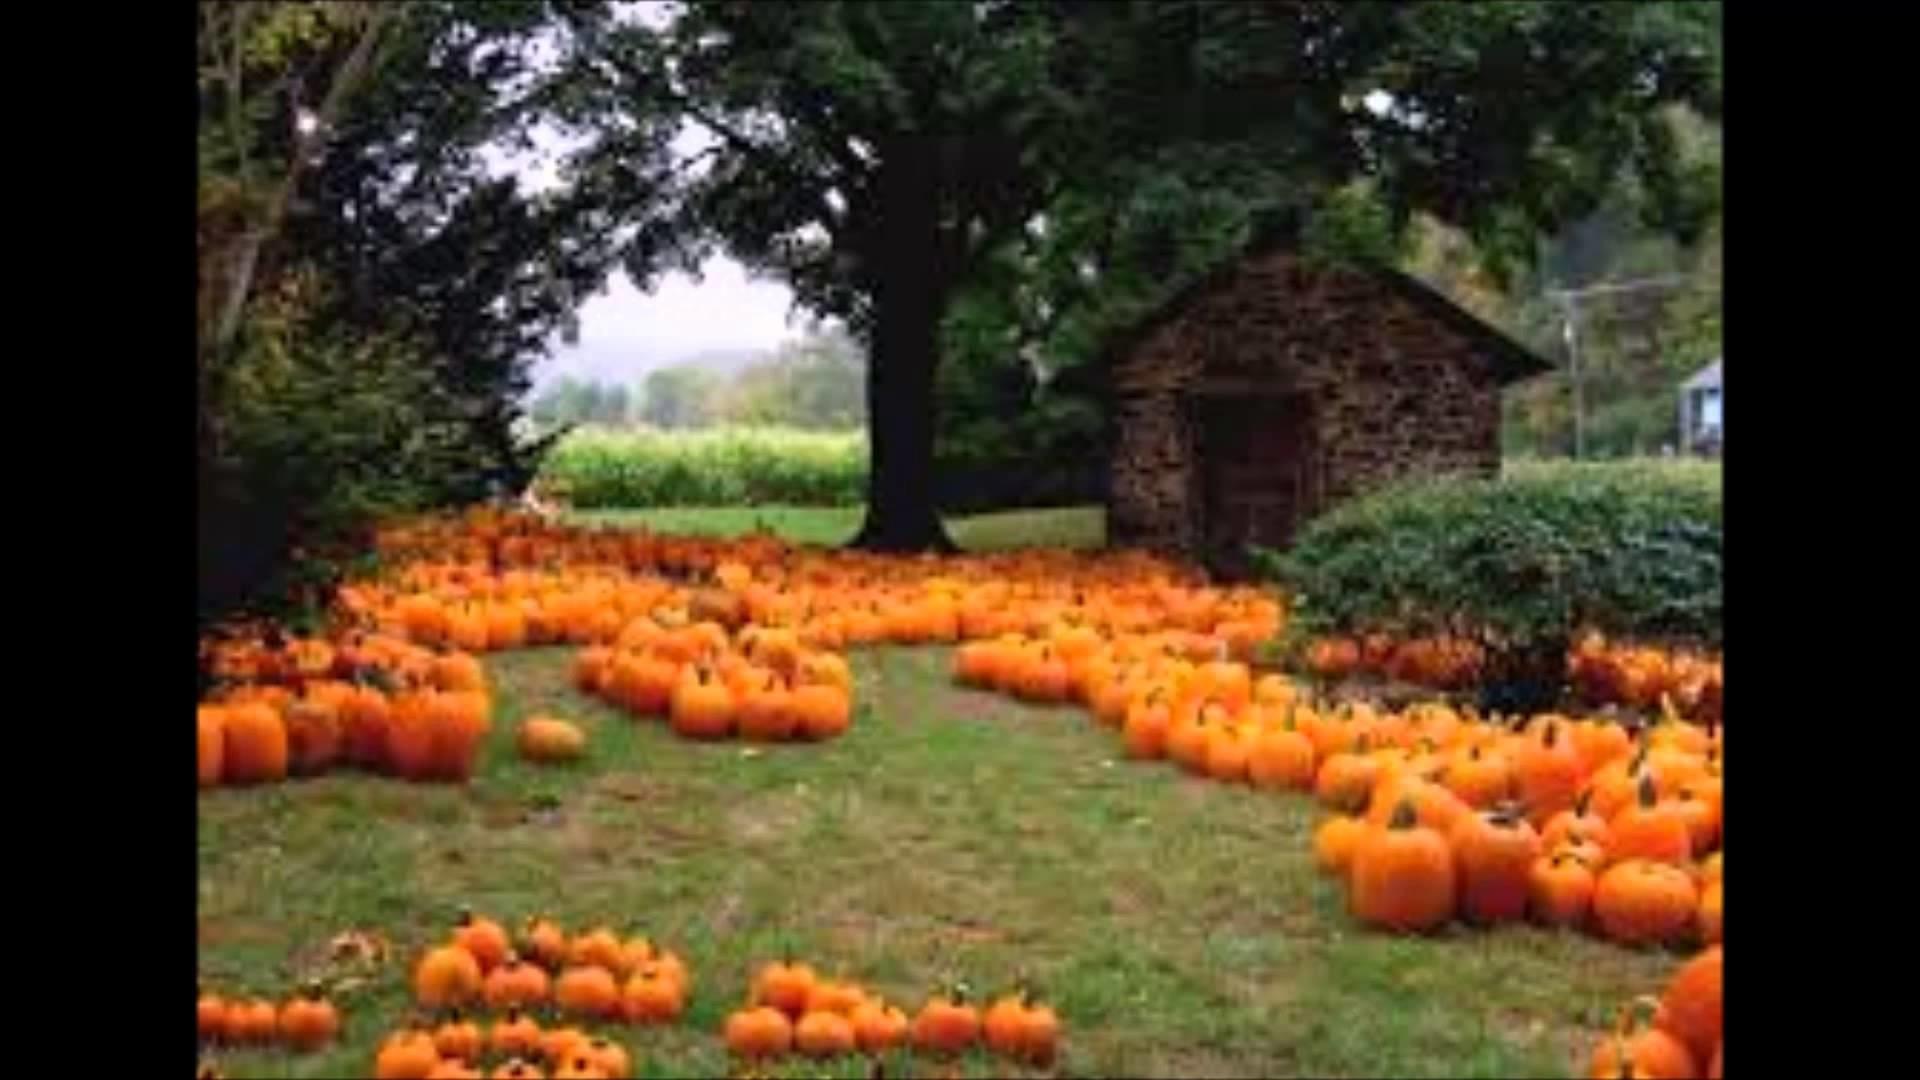 1197403 download fall pumpkin wallpaper 1920x1080 for ipad pro